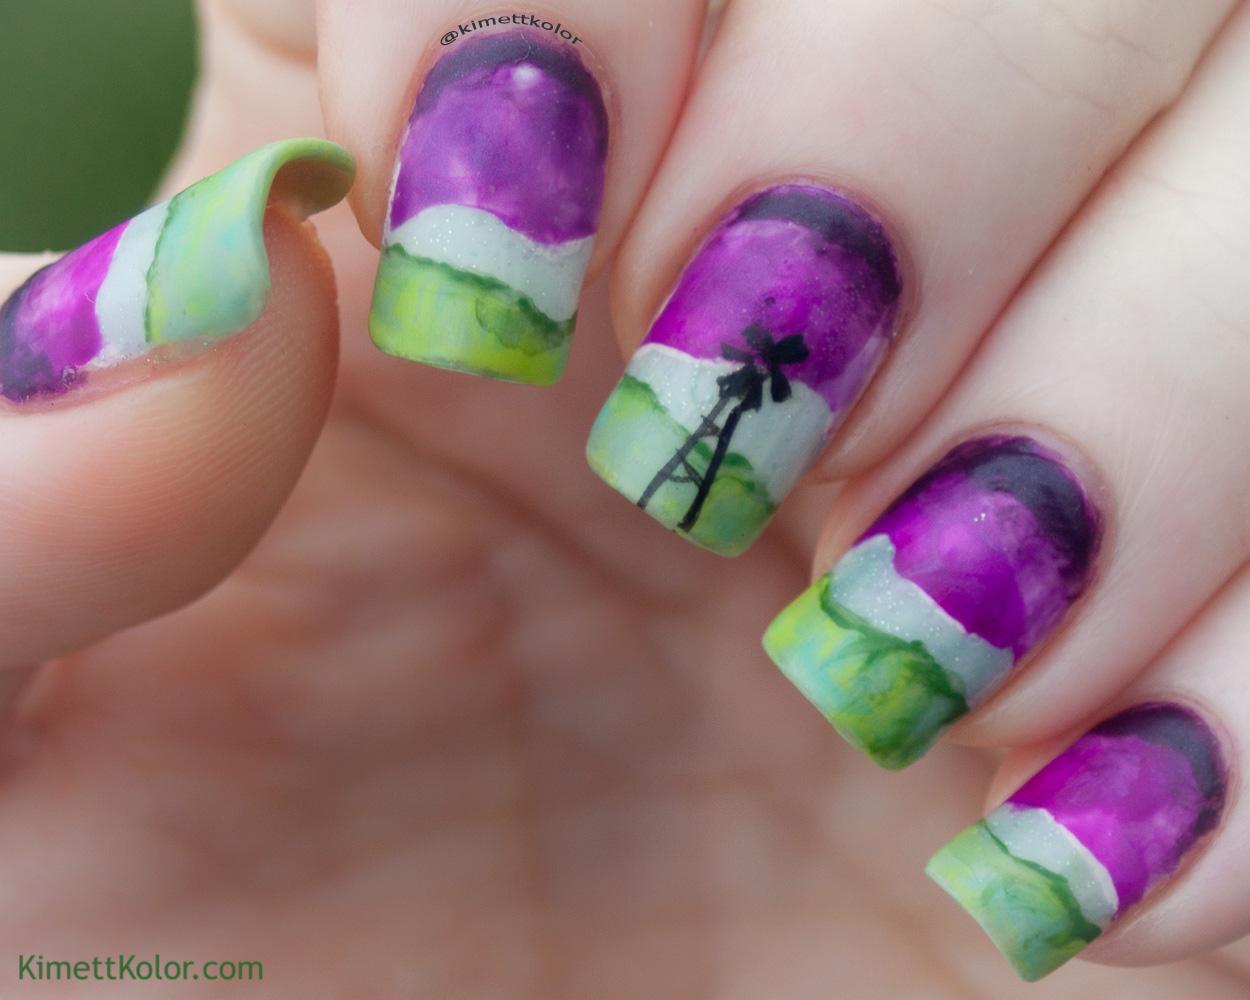 KimettKolor.com Stormy Skies Nail Art